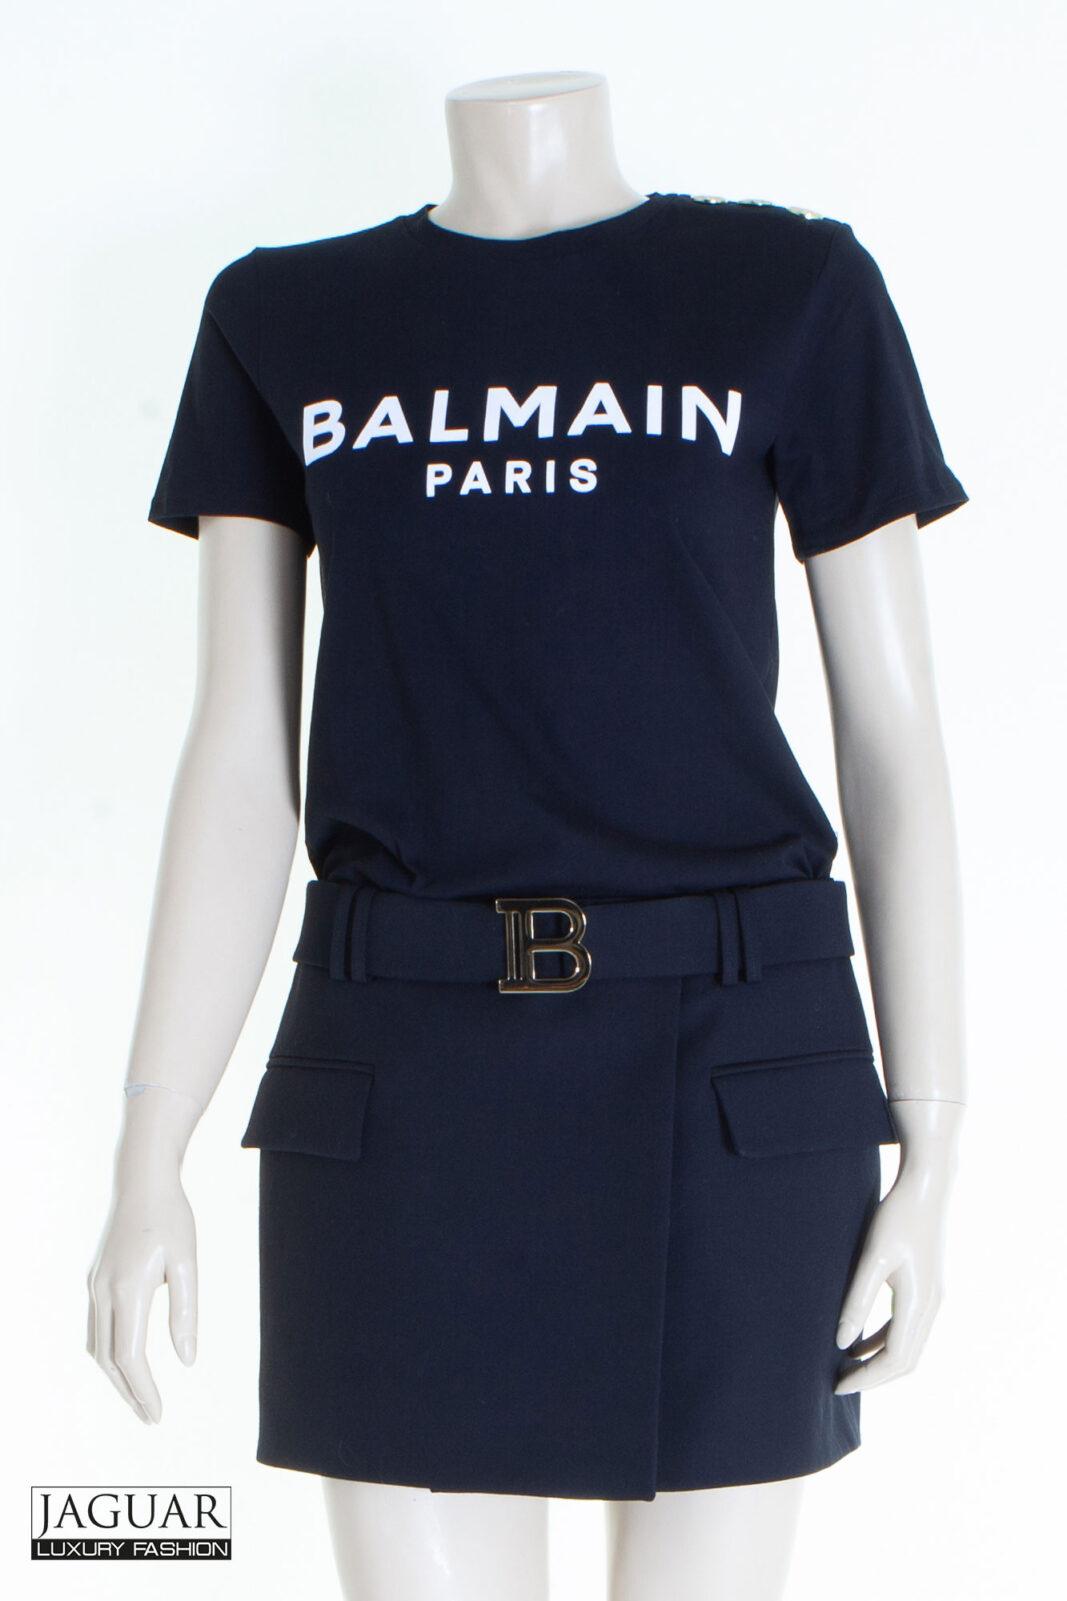 Balmain skirt black